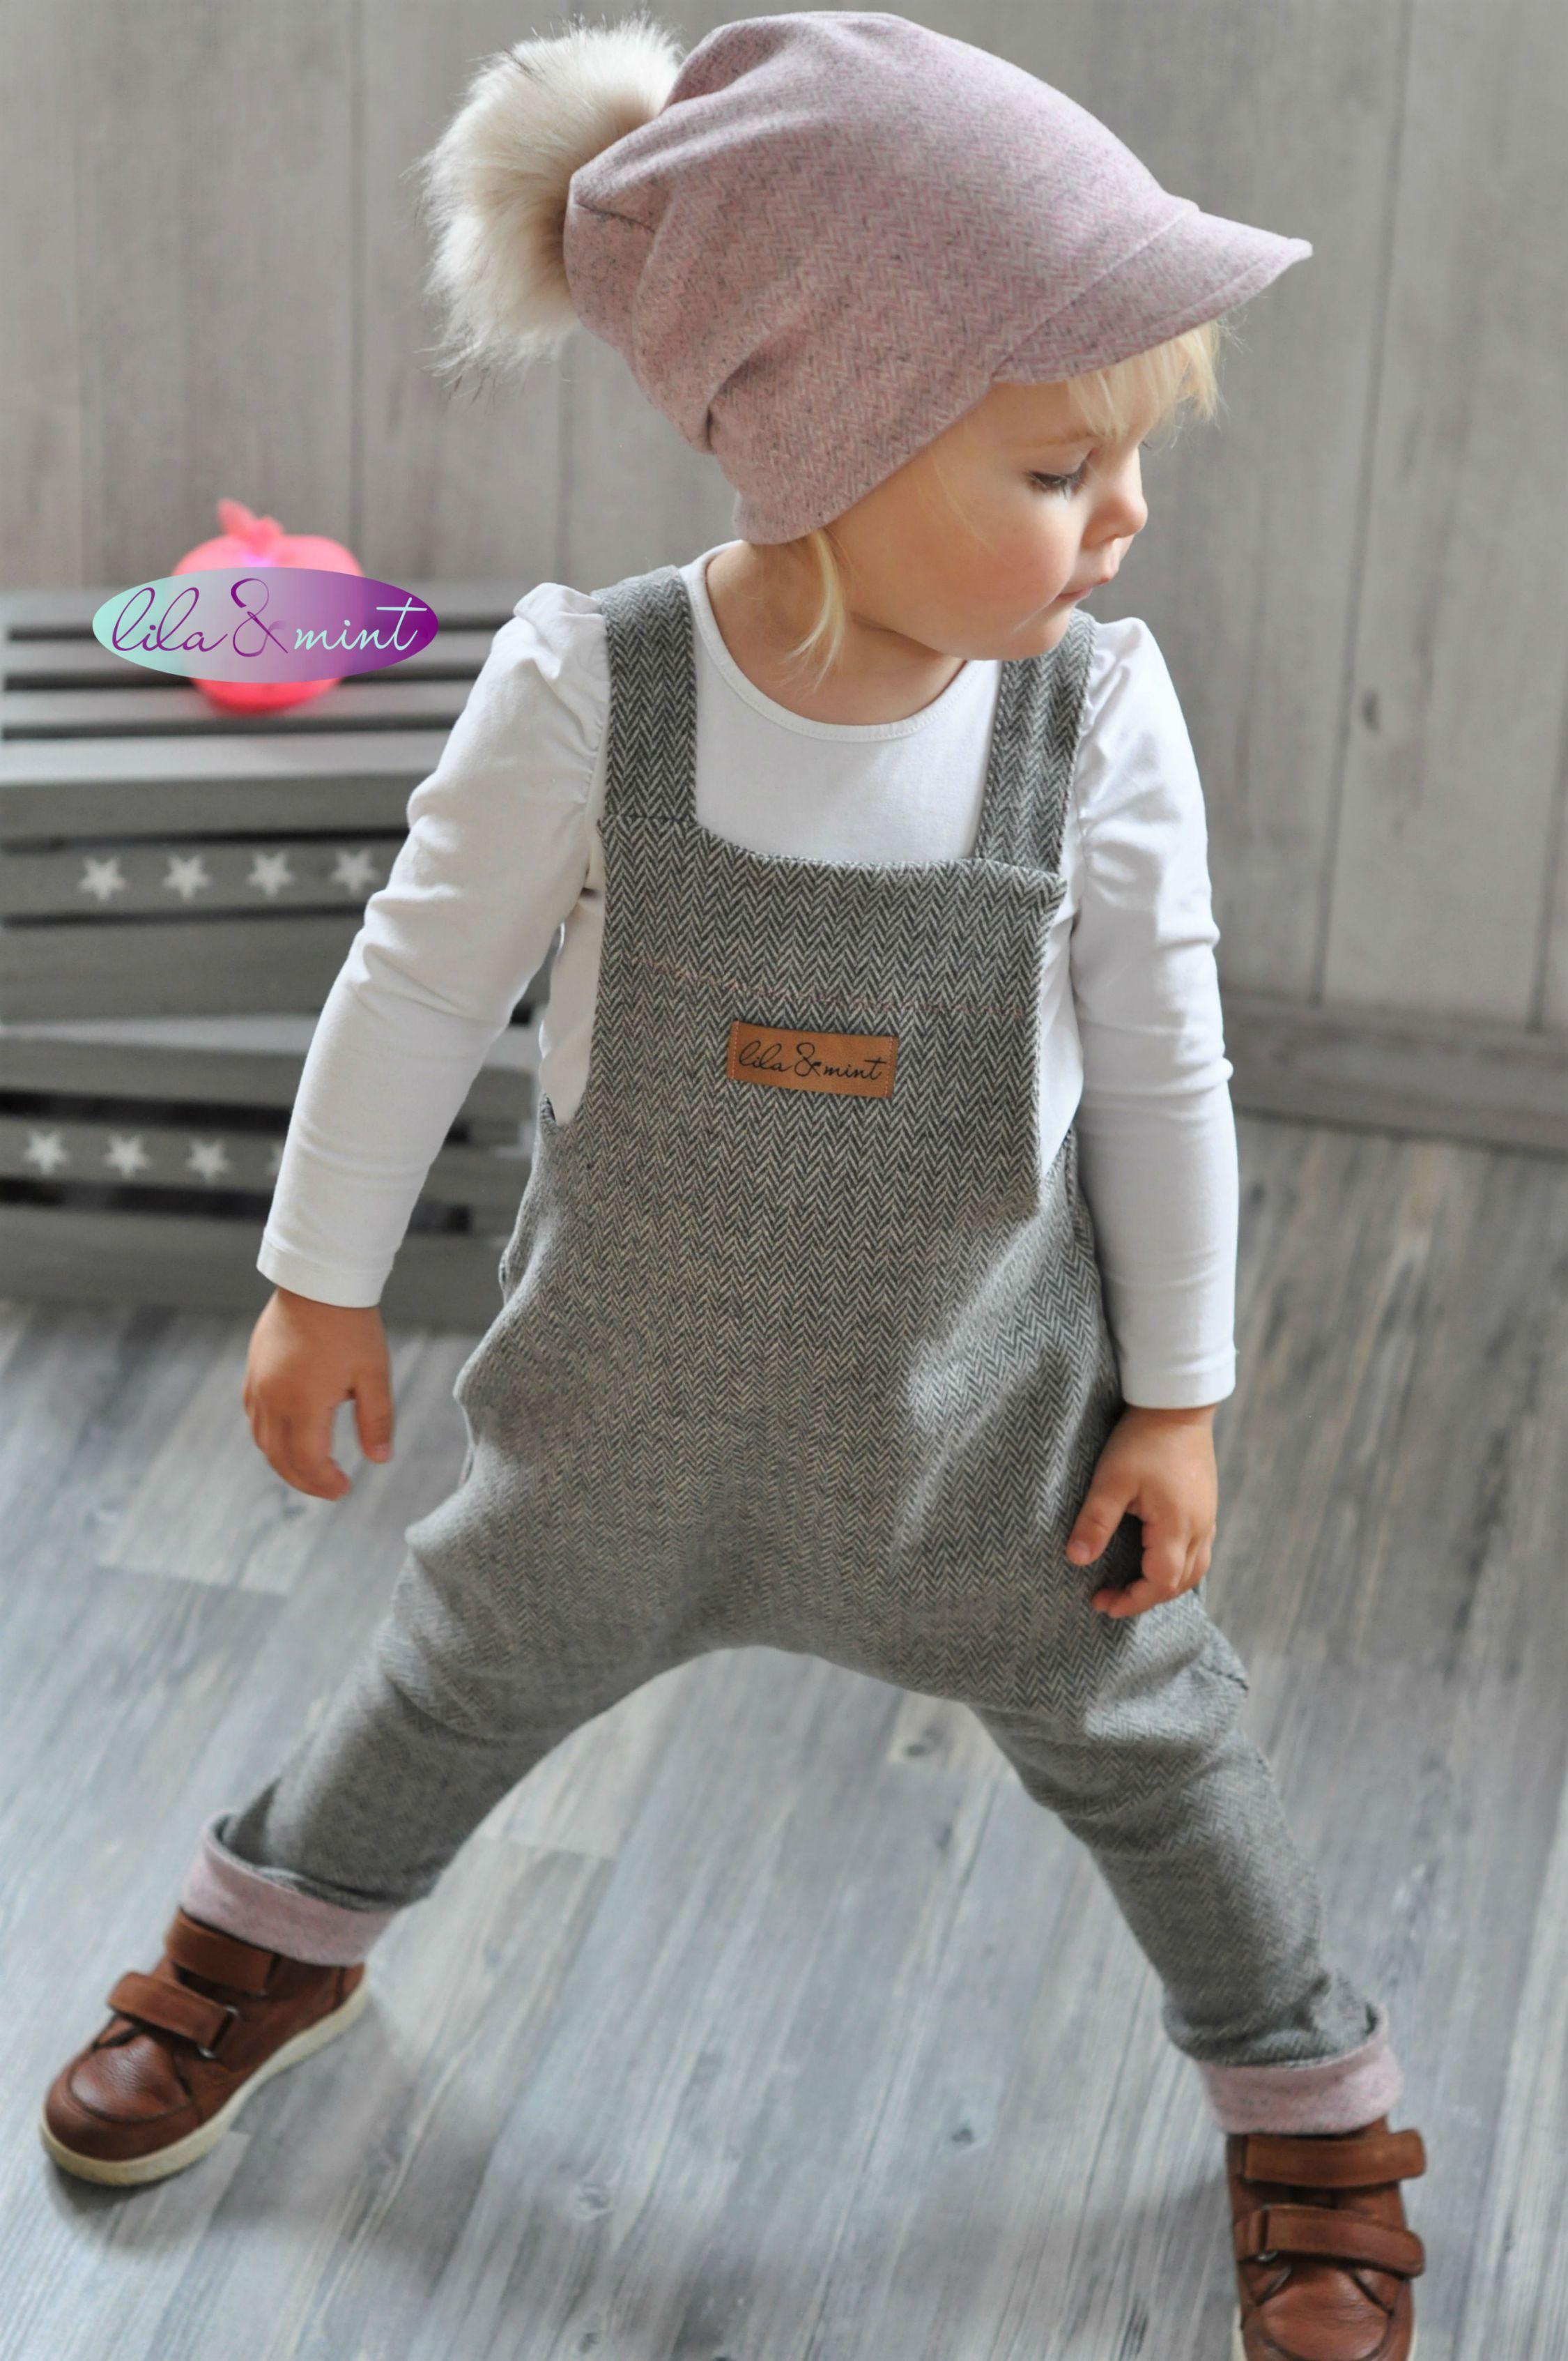 Jacquard Max und das perfekte Outfit | Outfit, Stoffe und Nähen